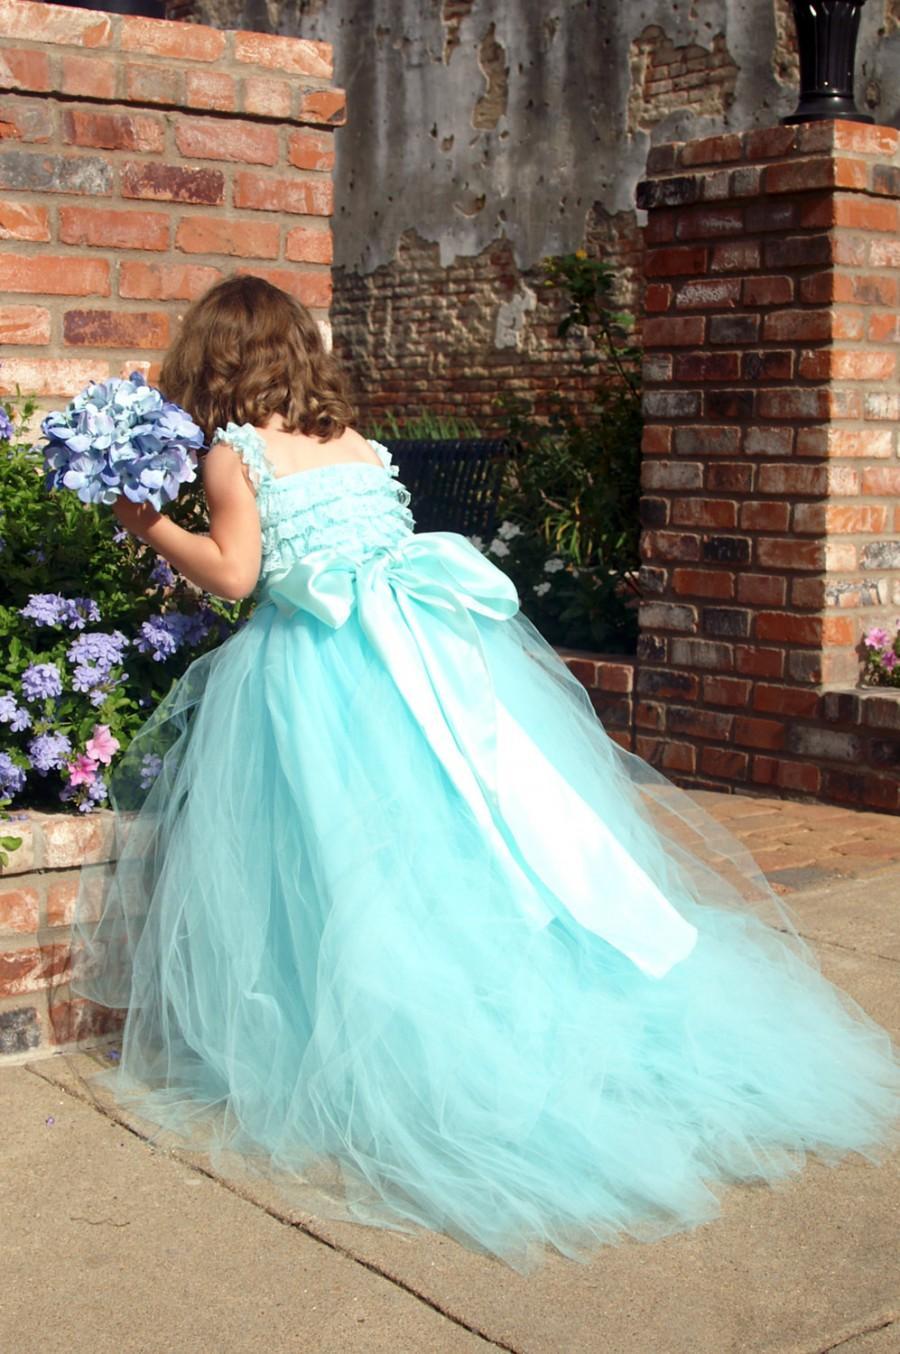 Handcrafted Bridal Length Tulle Tutu Skirt For Flowergirl Or ...